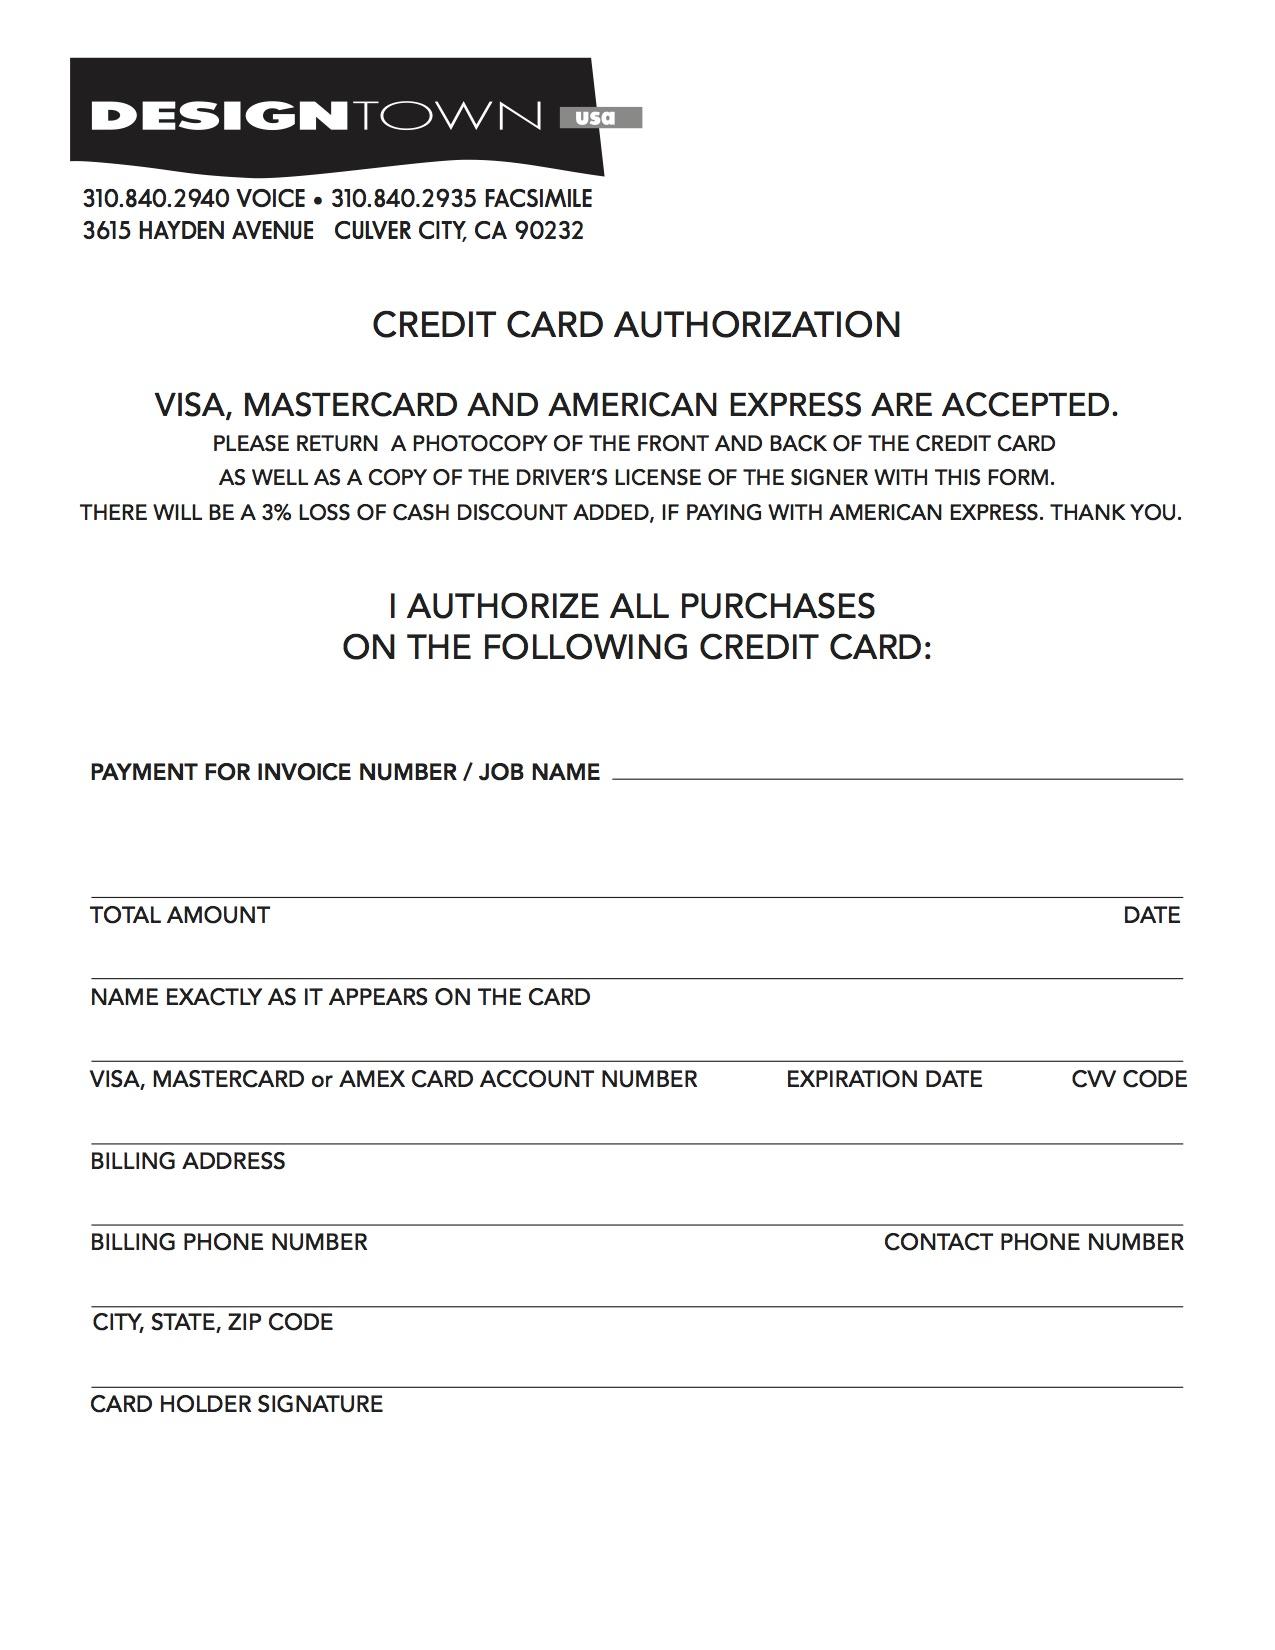 DTUSA_credit_card Auth.jpg